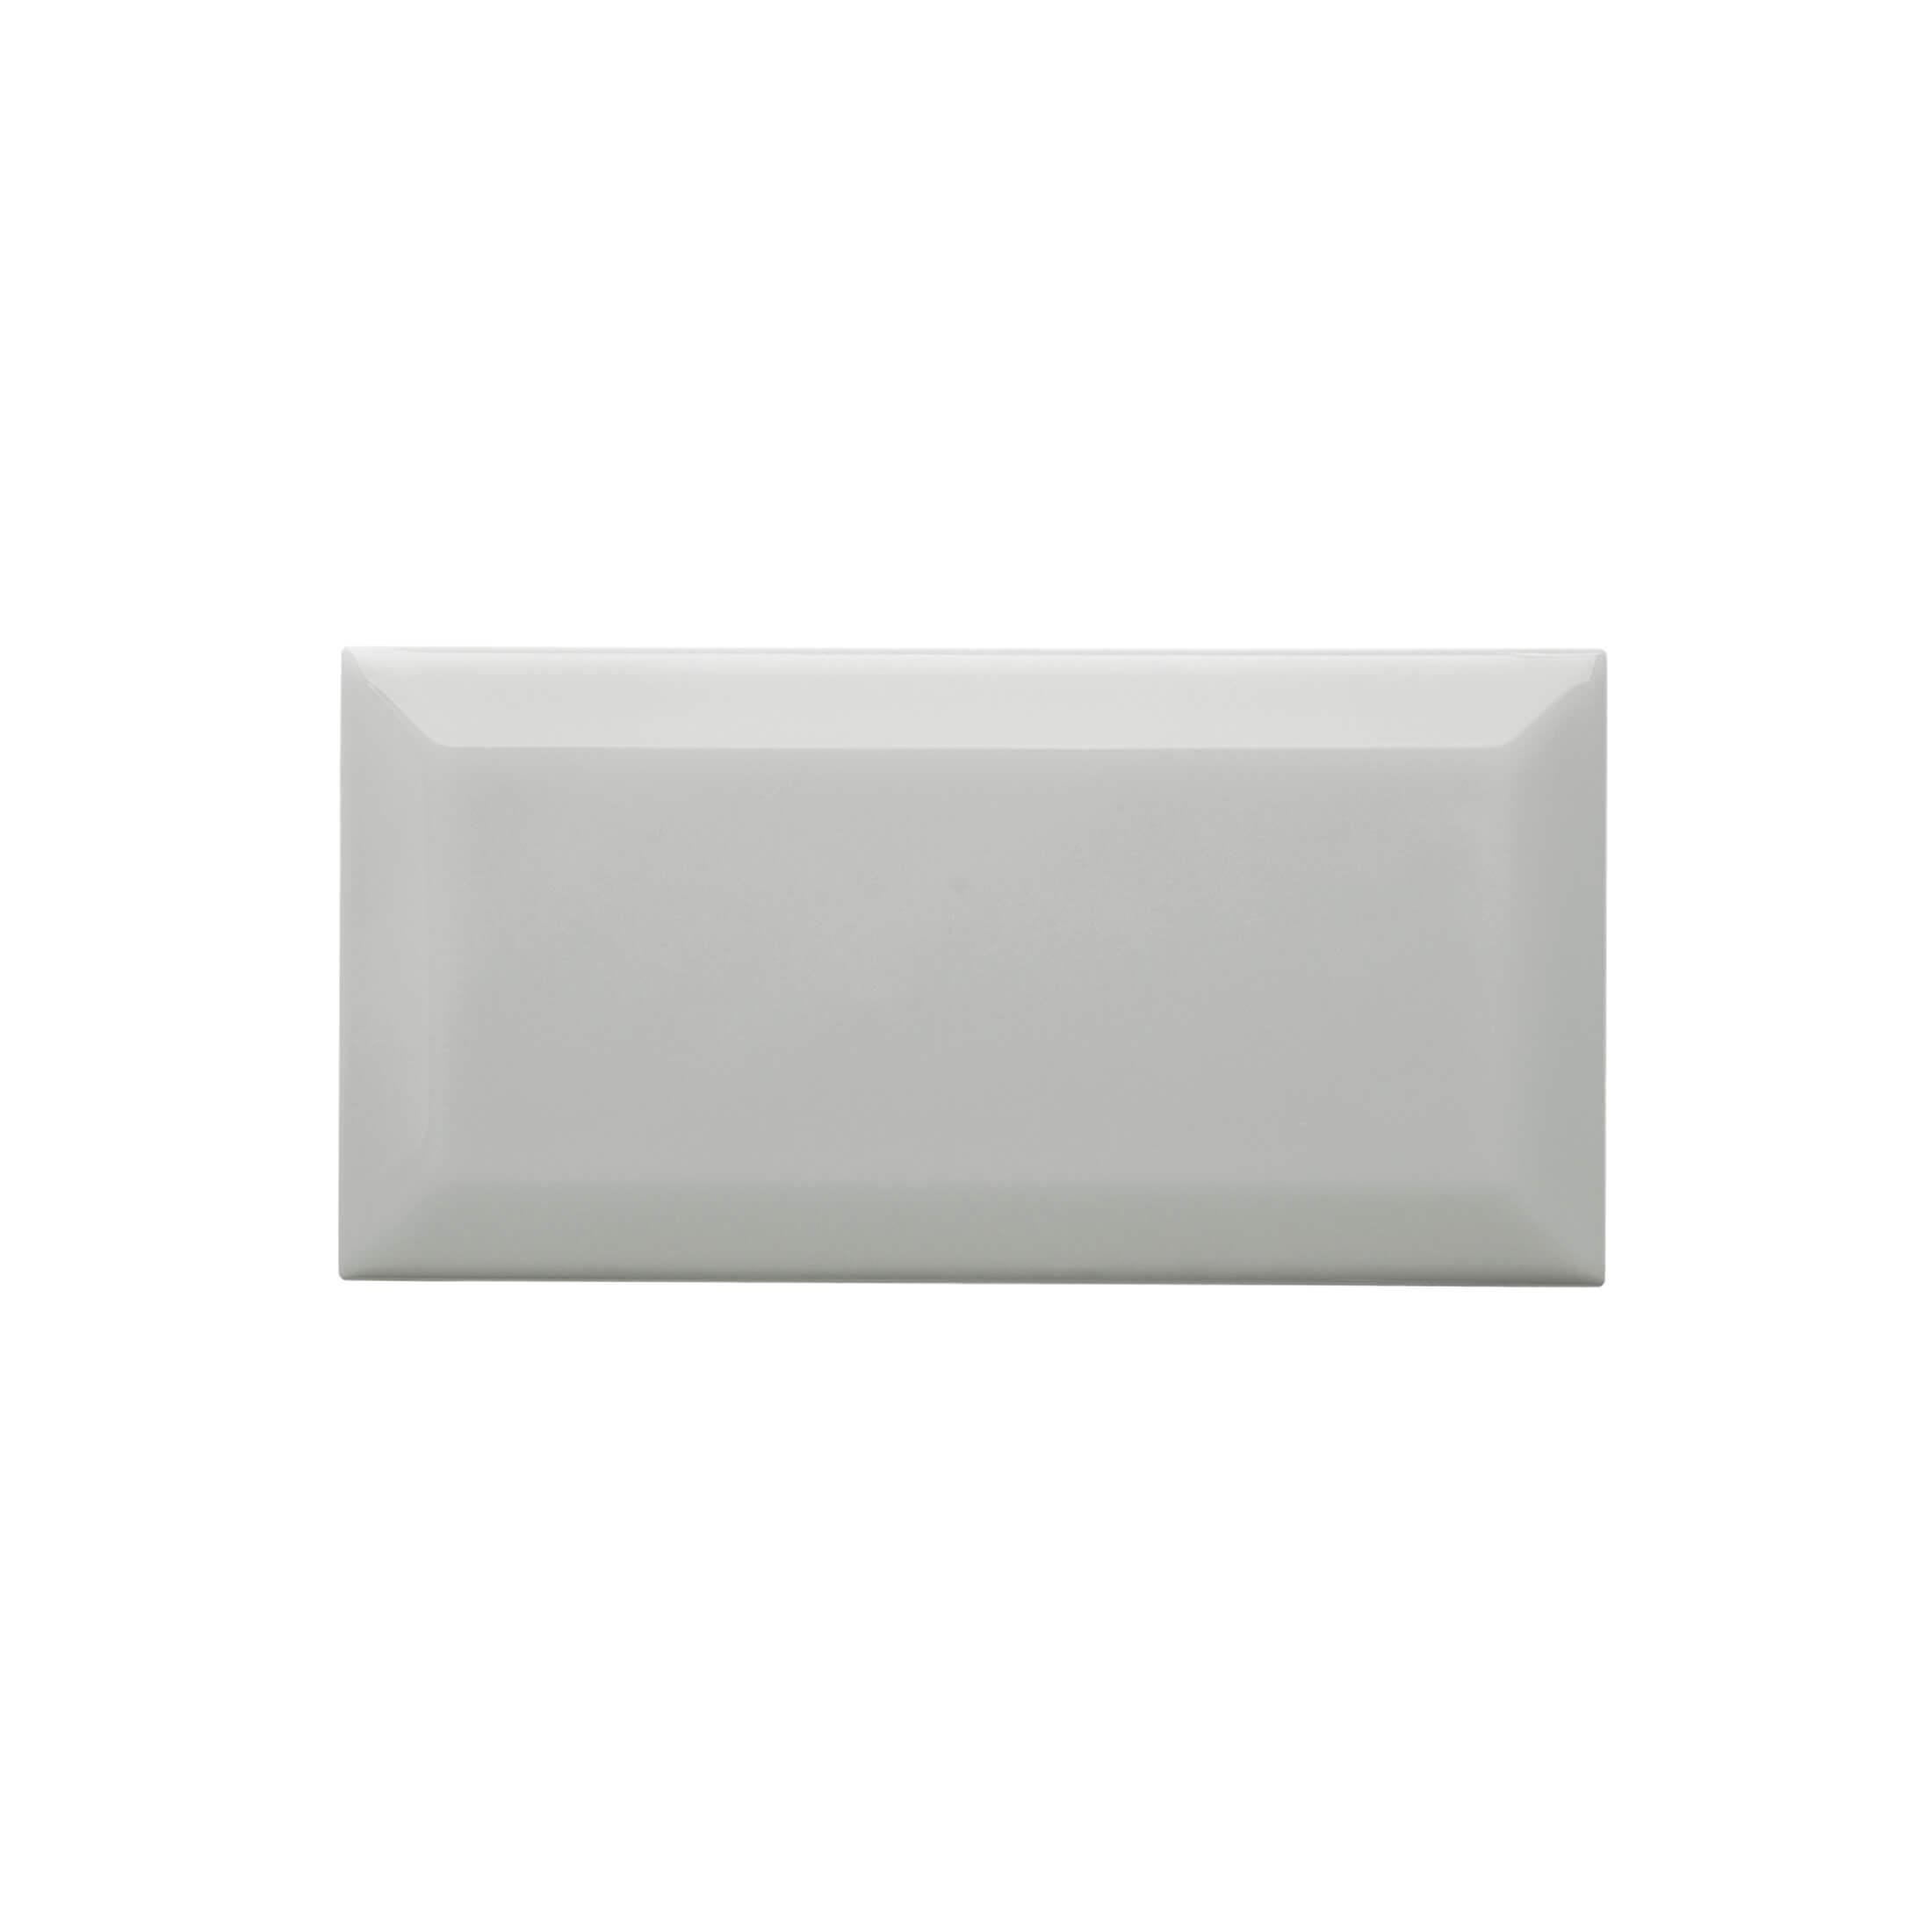 ADNE2052 - BISELADO PB - 10 cm X 20 cm